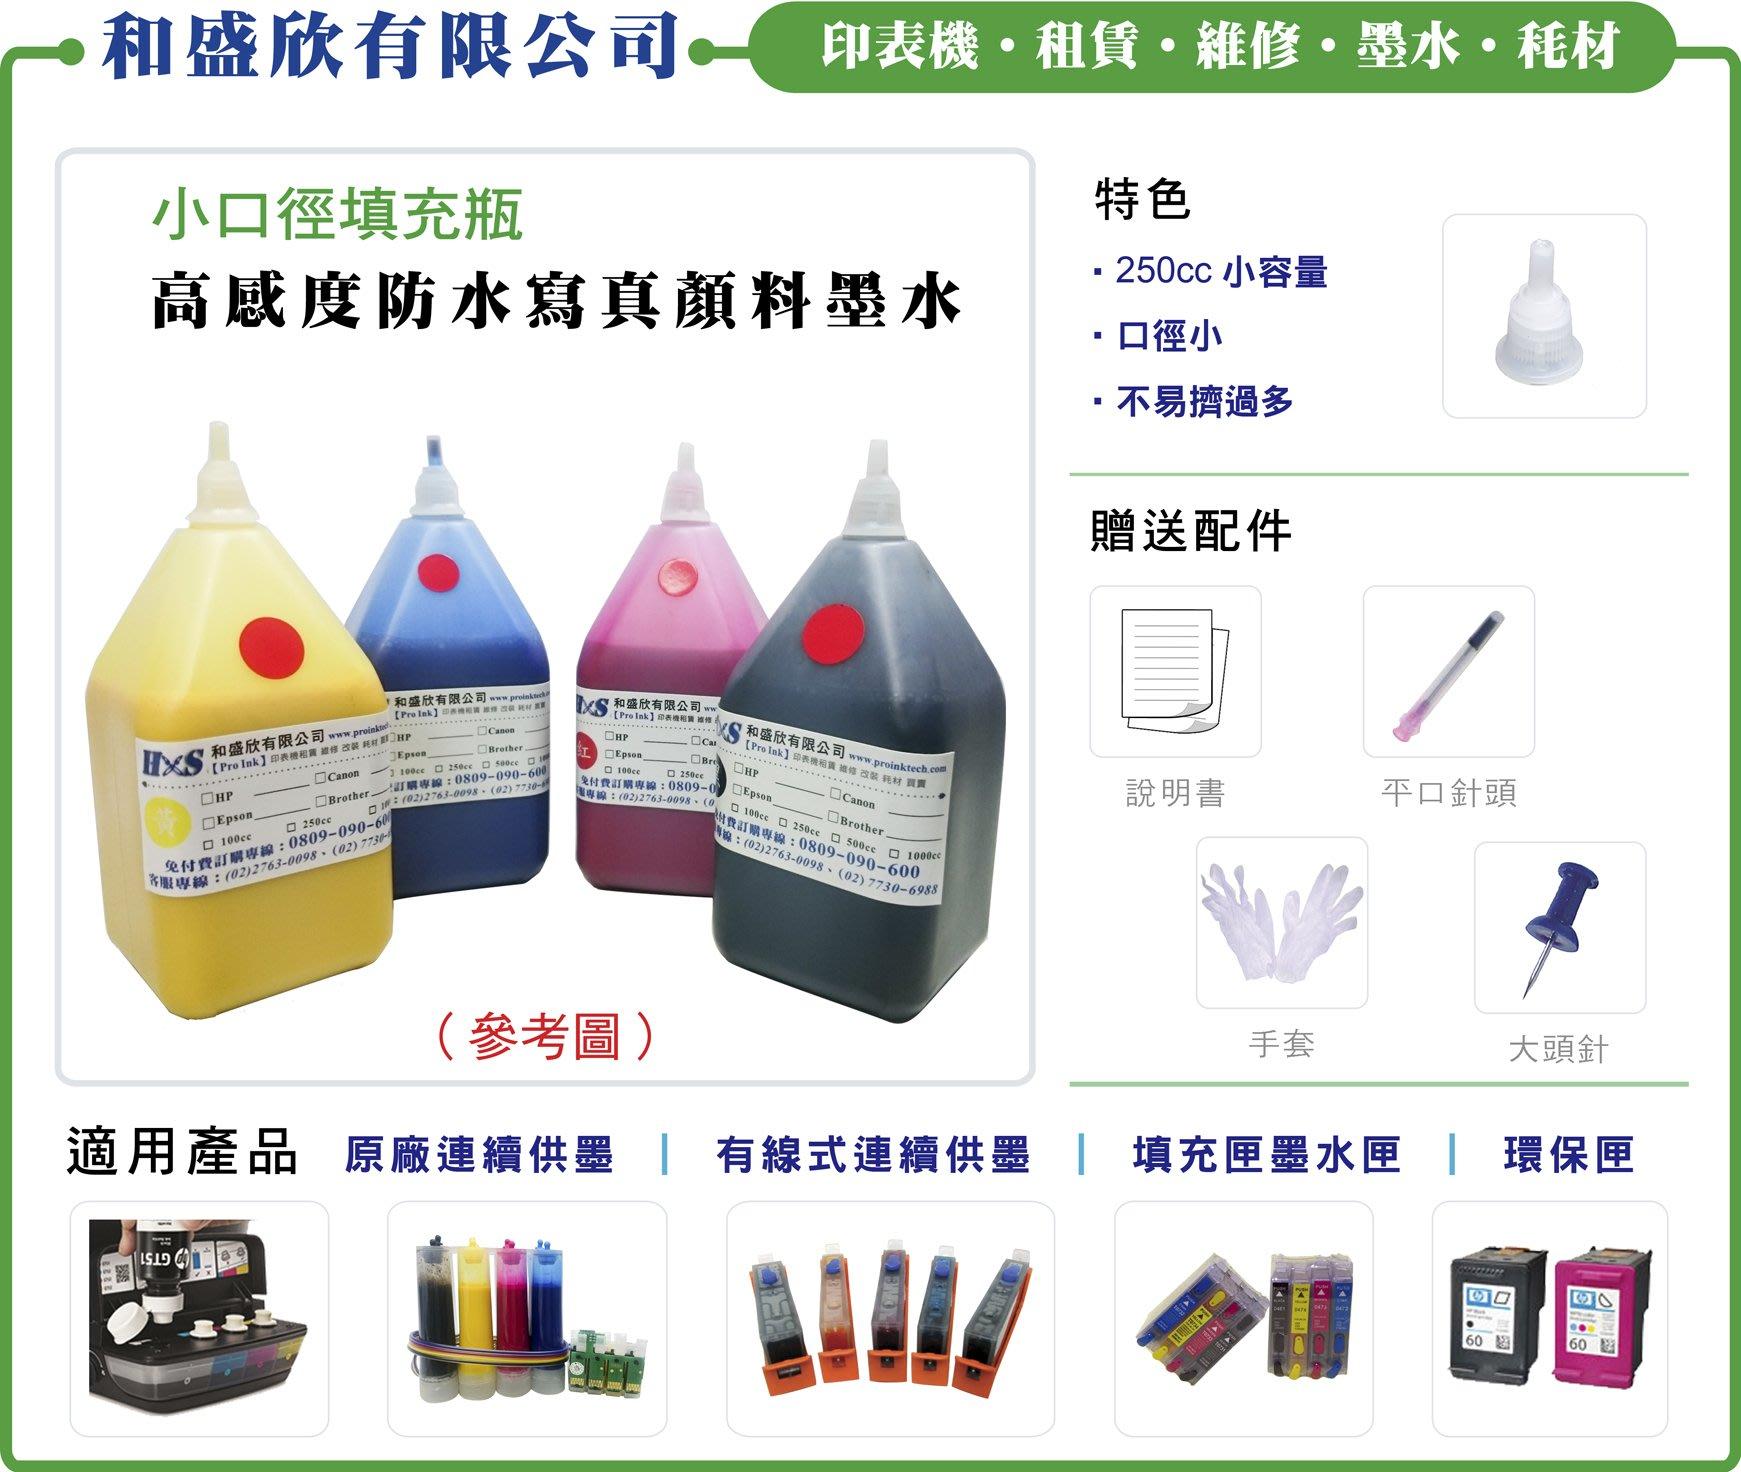 【Pro Ink 連續供墨】HP B109a/ B109n/ B110a/ B209a 專用防水寫真顏料 250cc